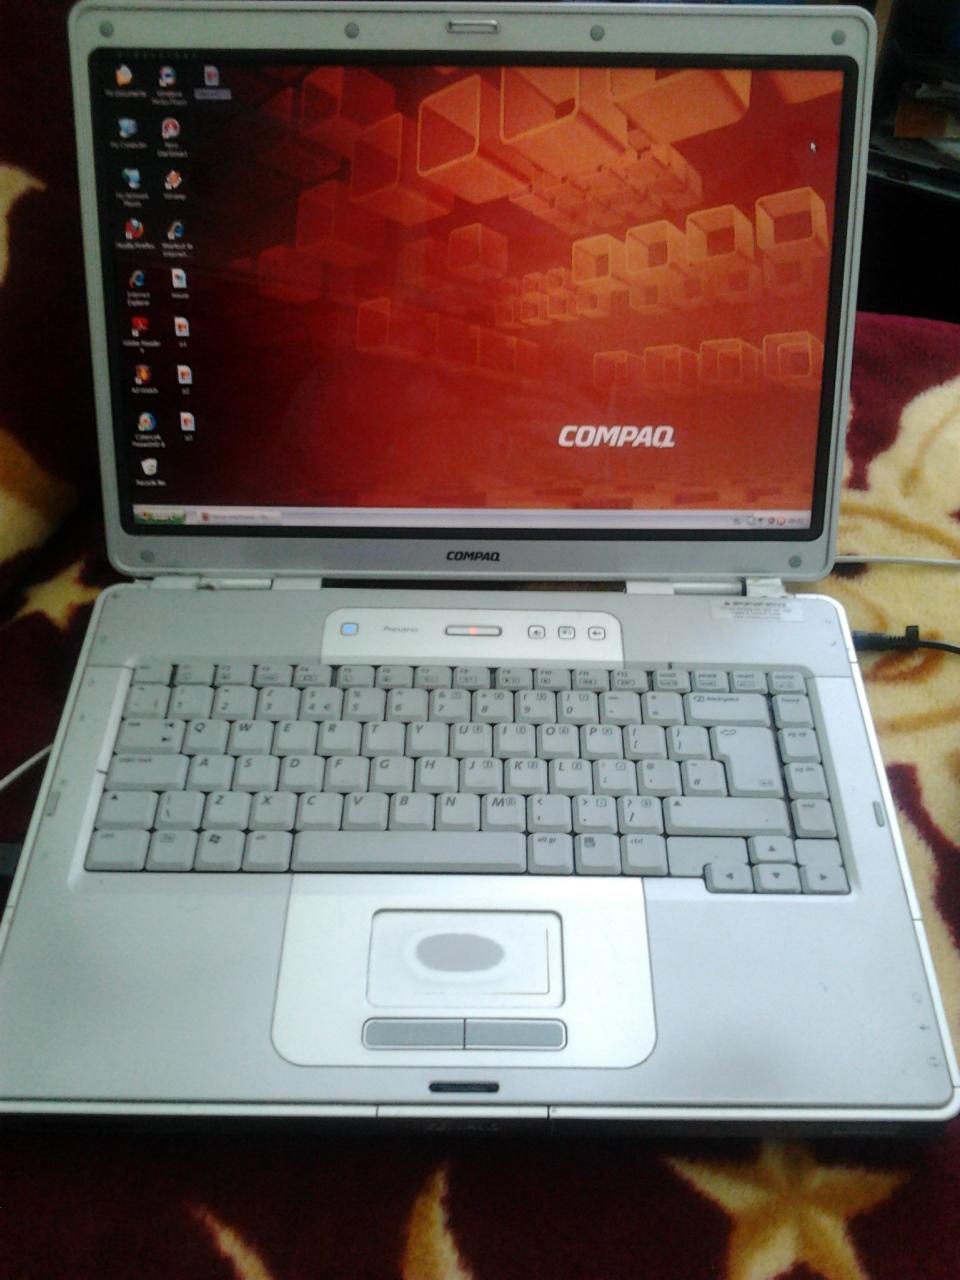 [Kupi�] Laptopa do oko�o 350-400z�